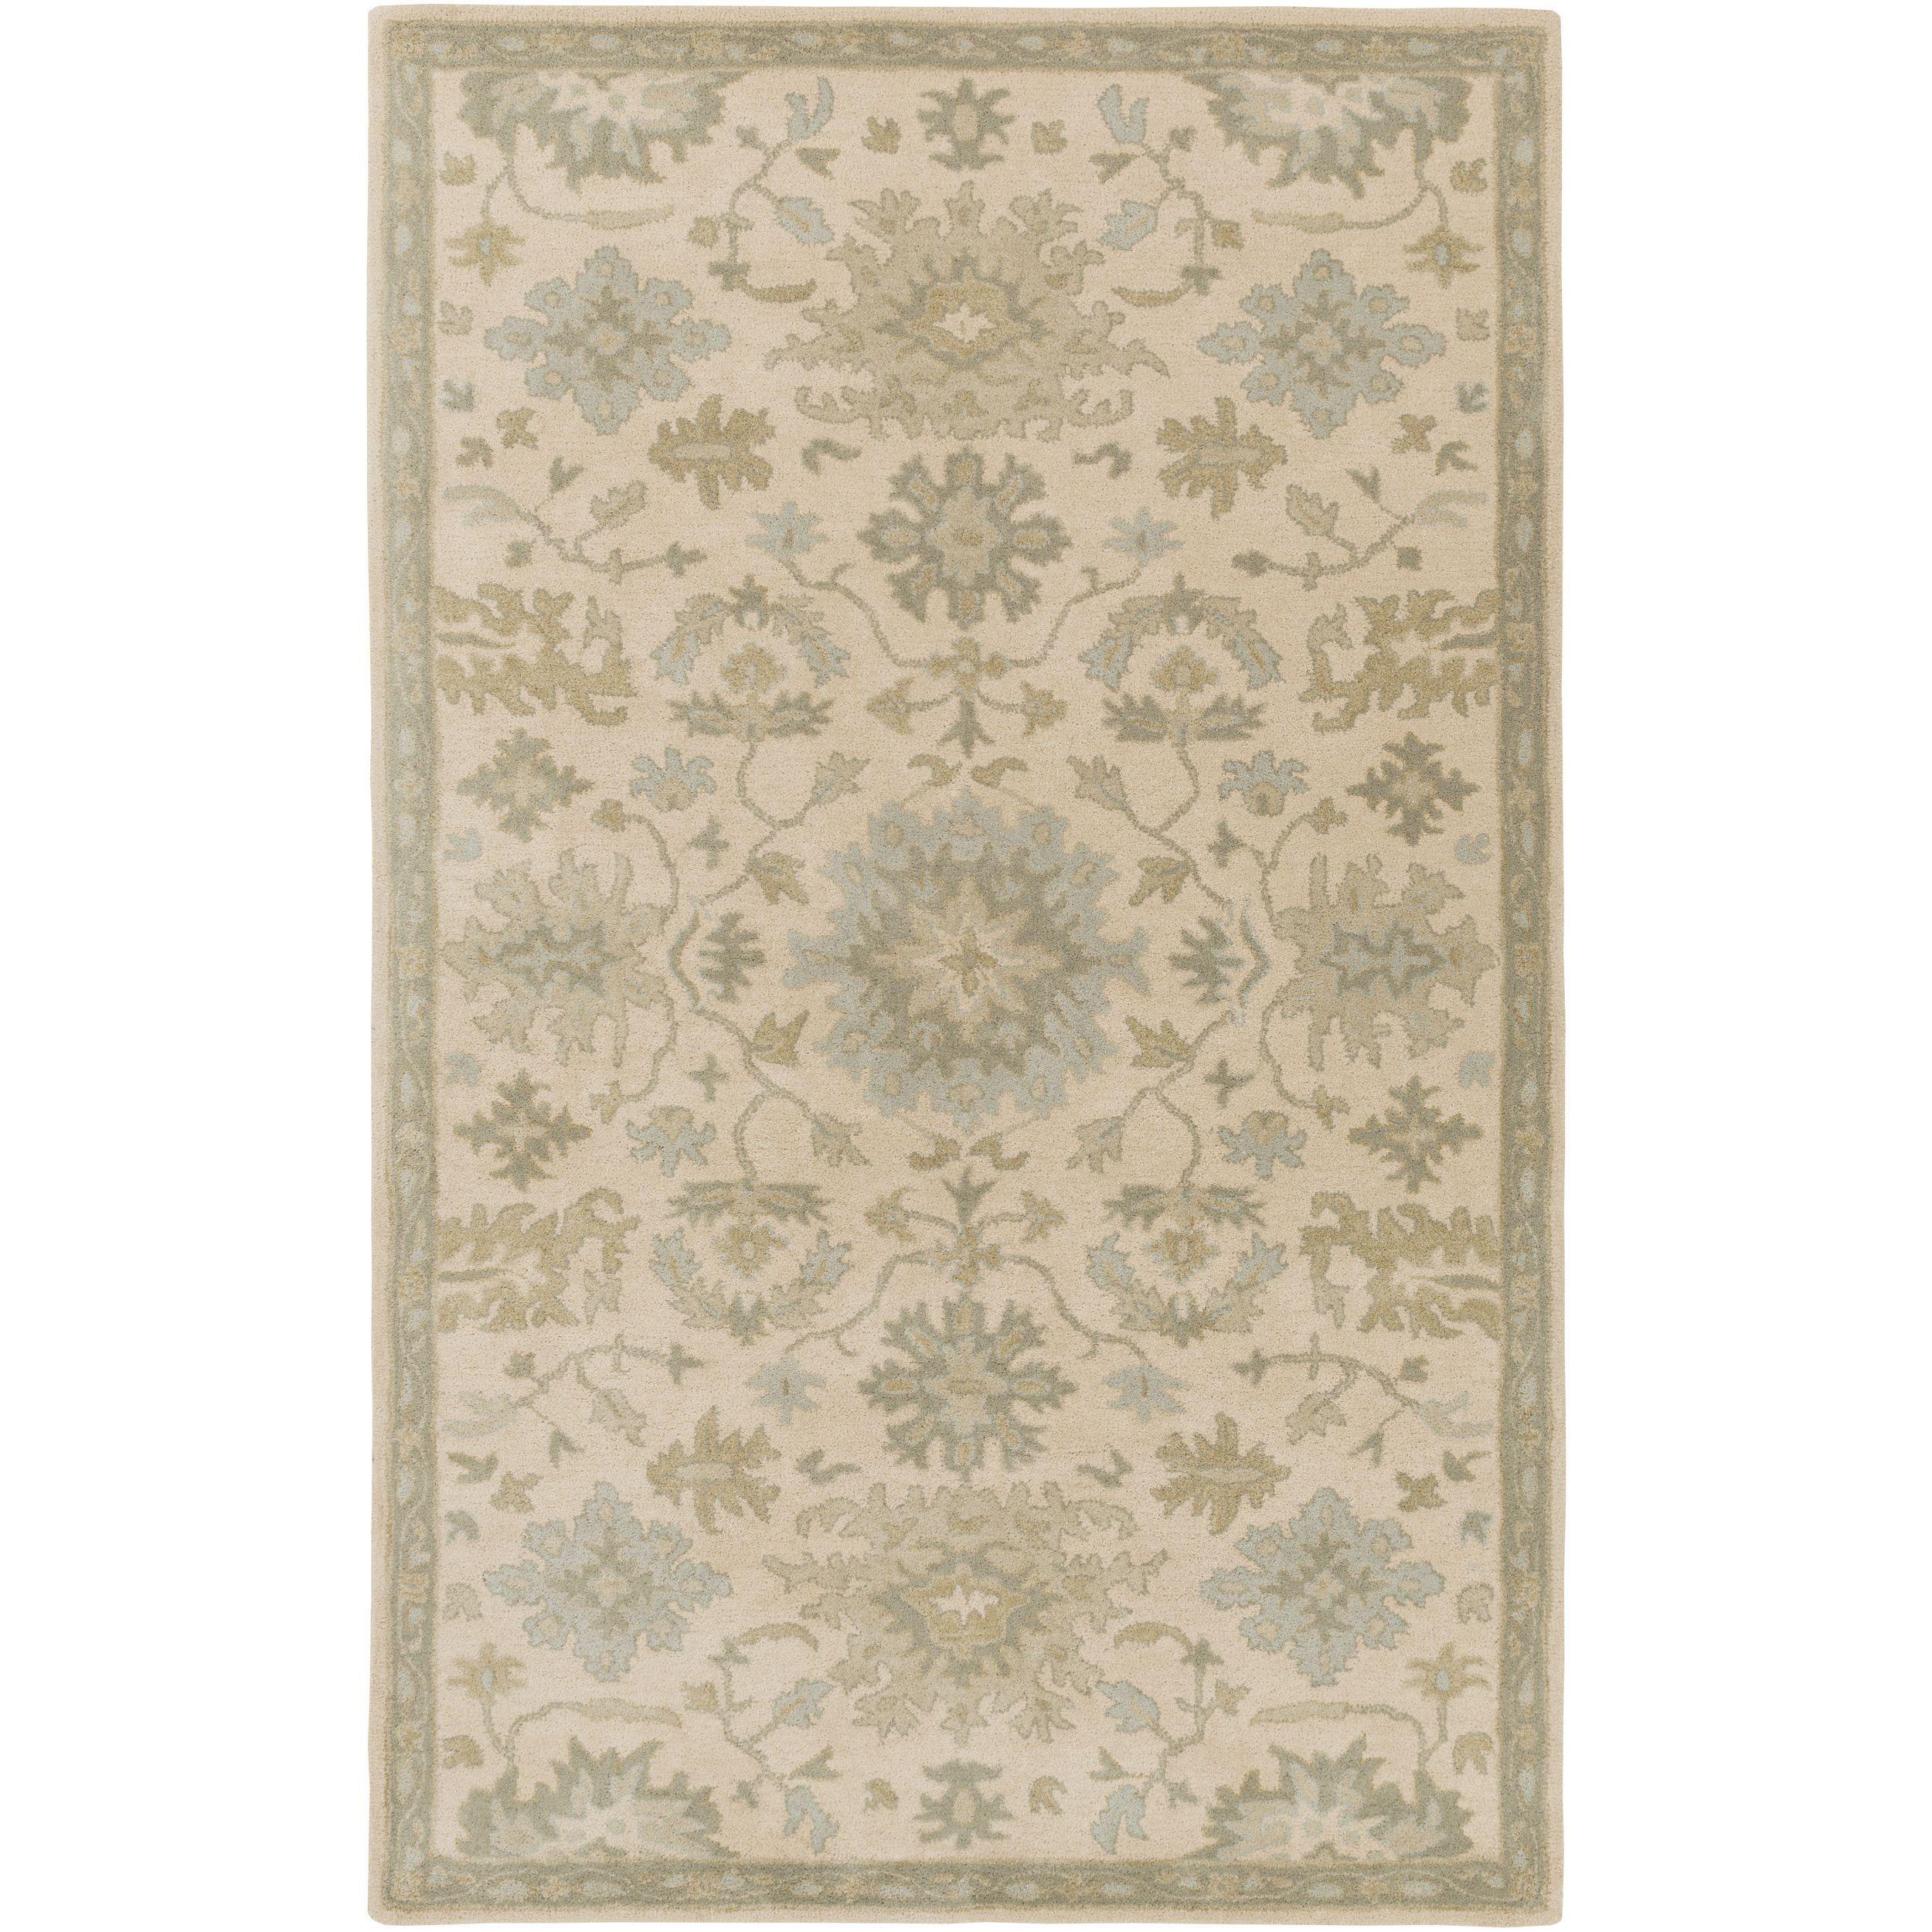 Hand Tufted Tipton Floral Wool Rug 10 X 14 Beige 10 X 14